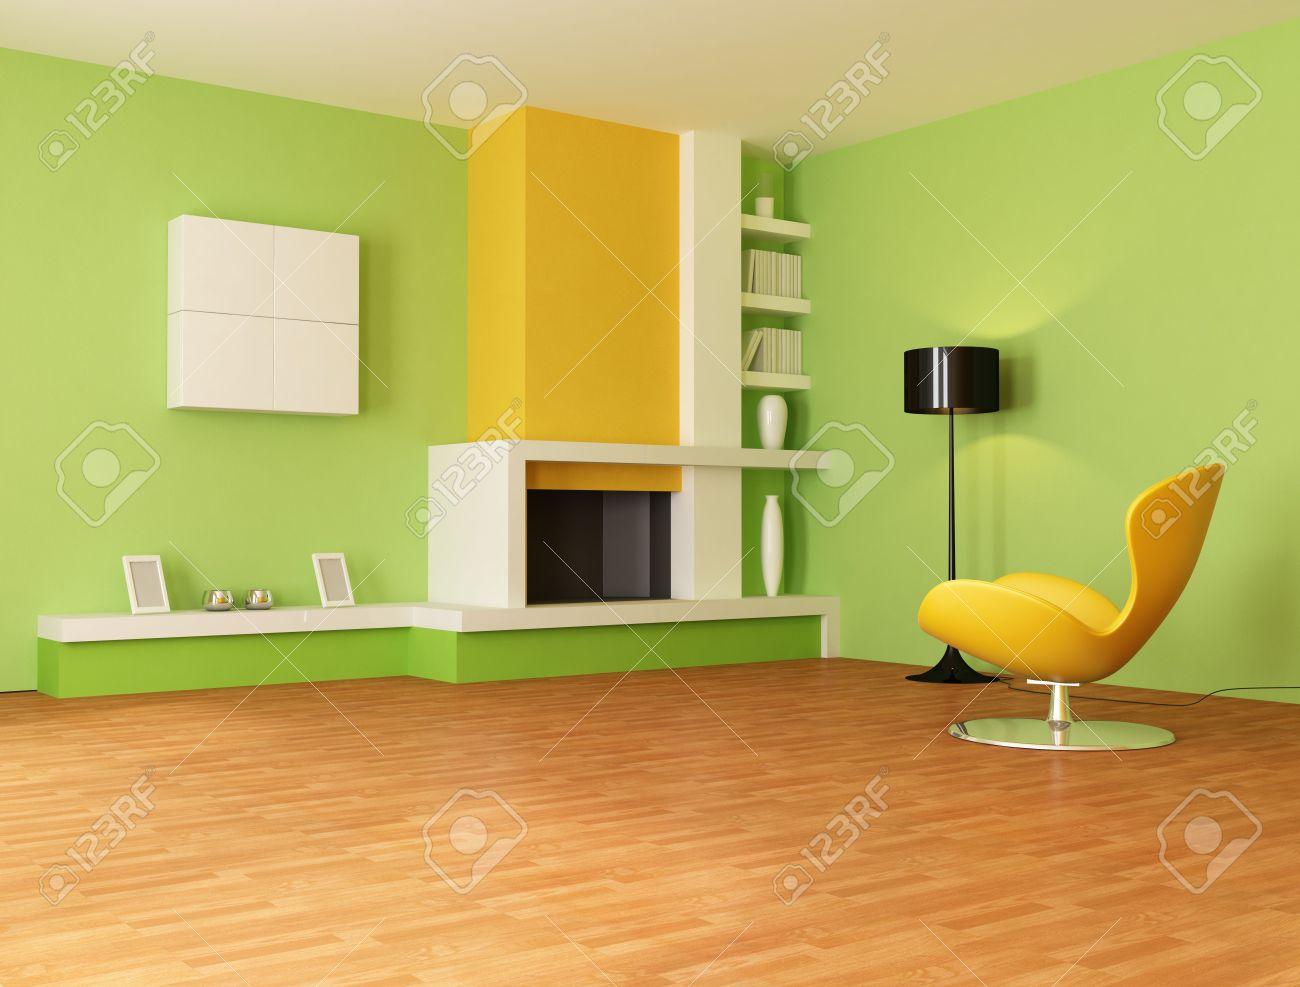 Orange Yellow Green Living Room Yes Yes Go - Orange living room design